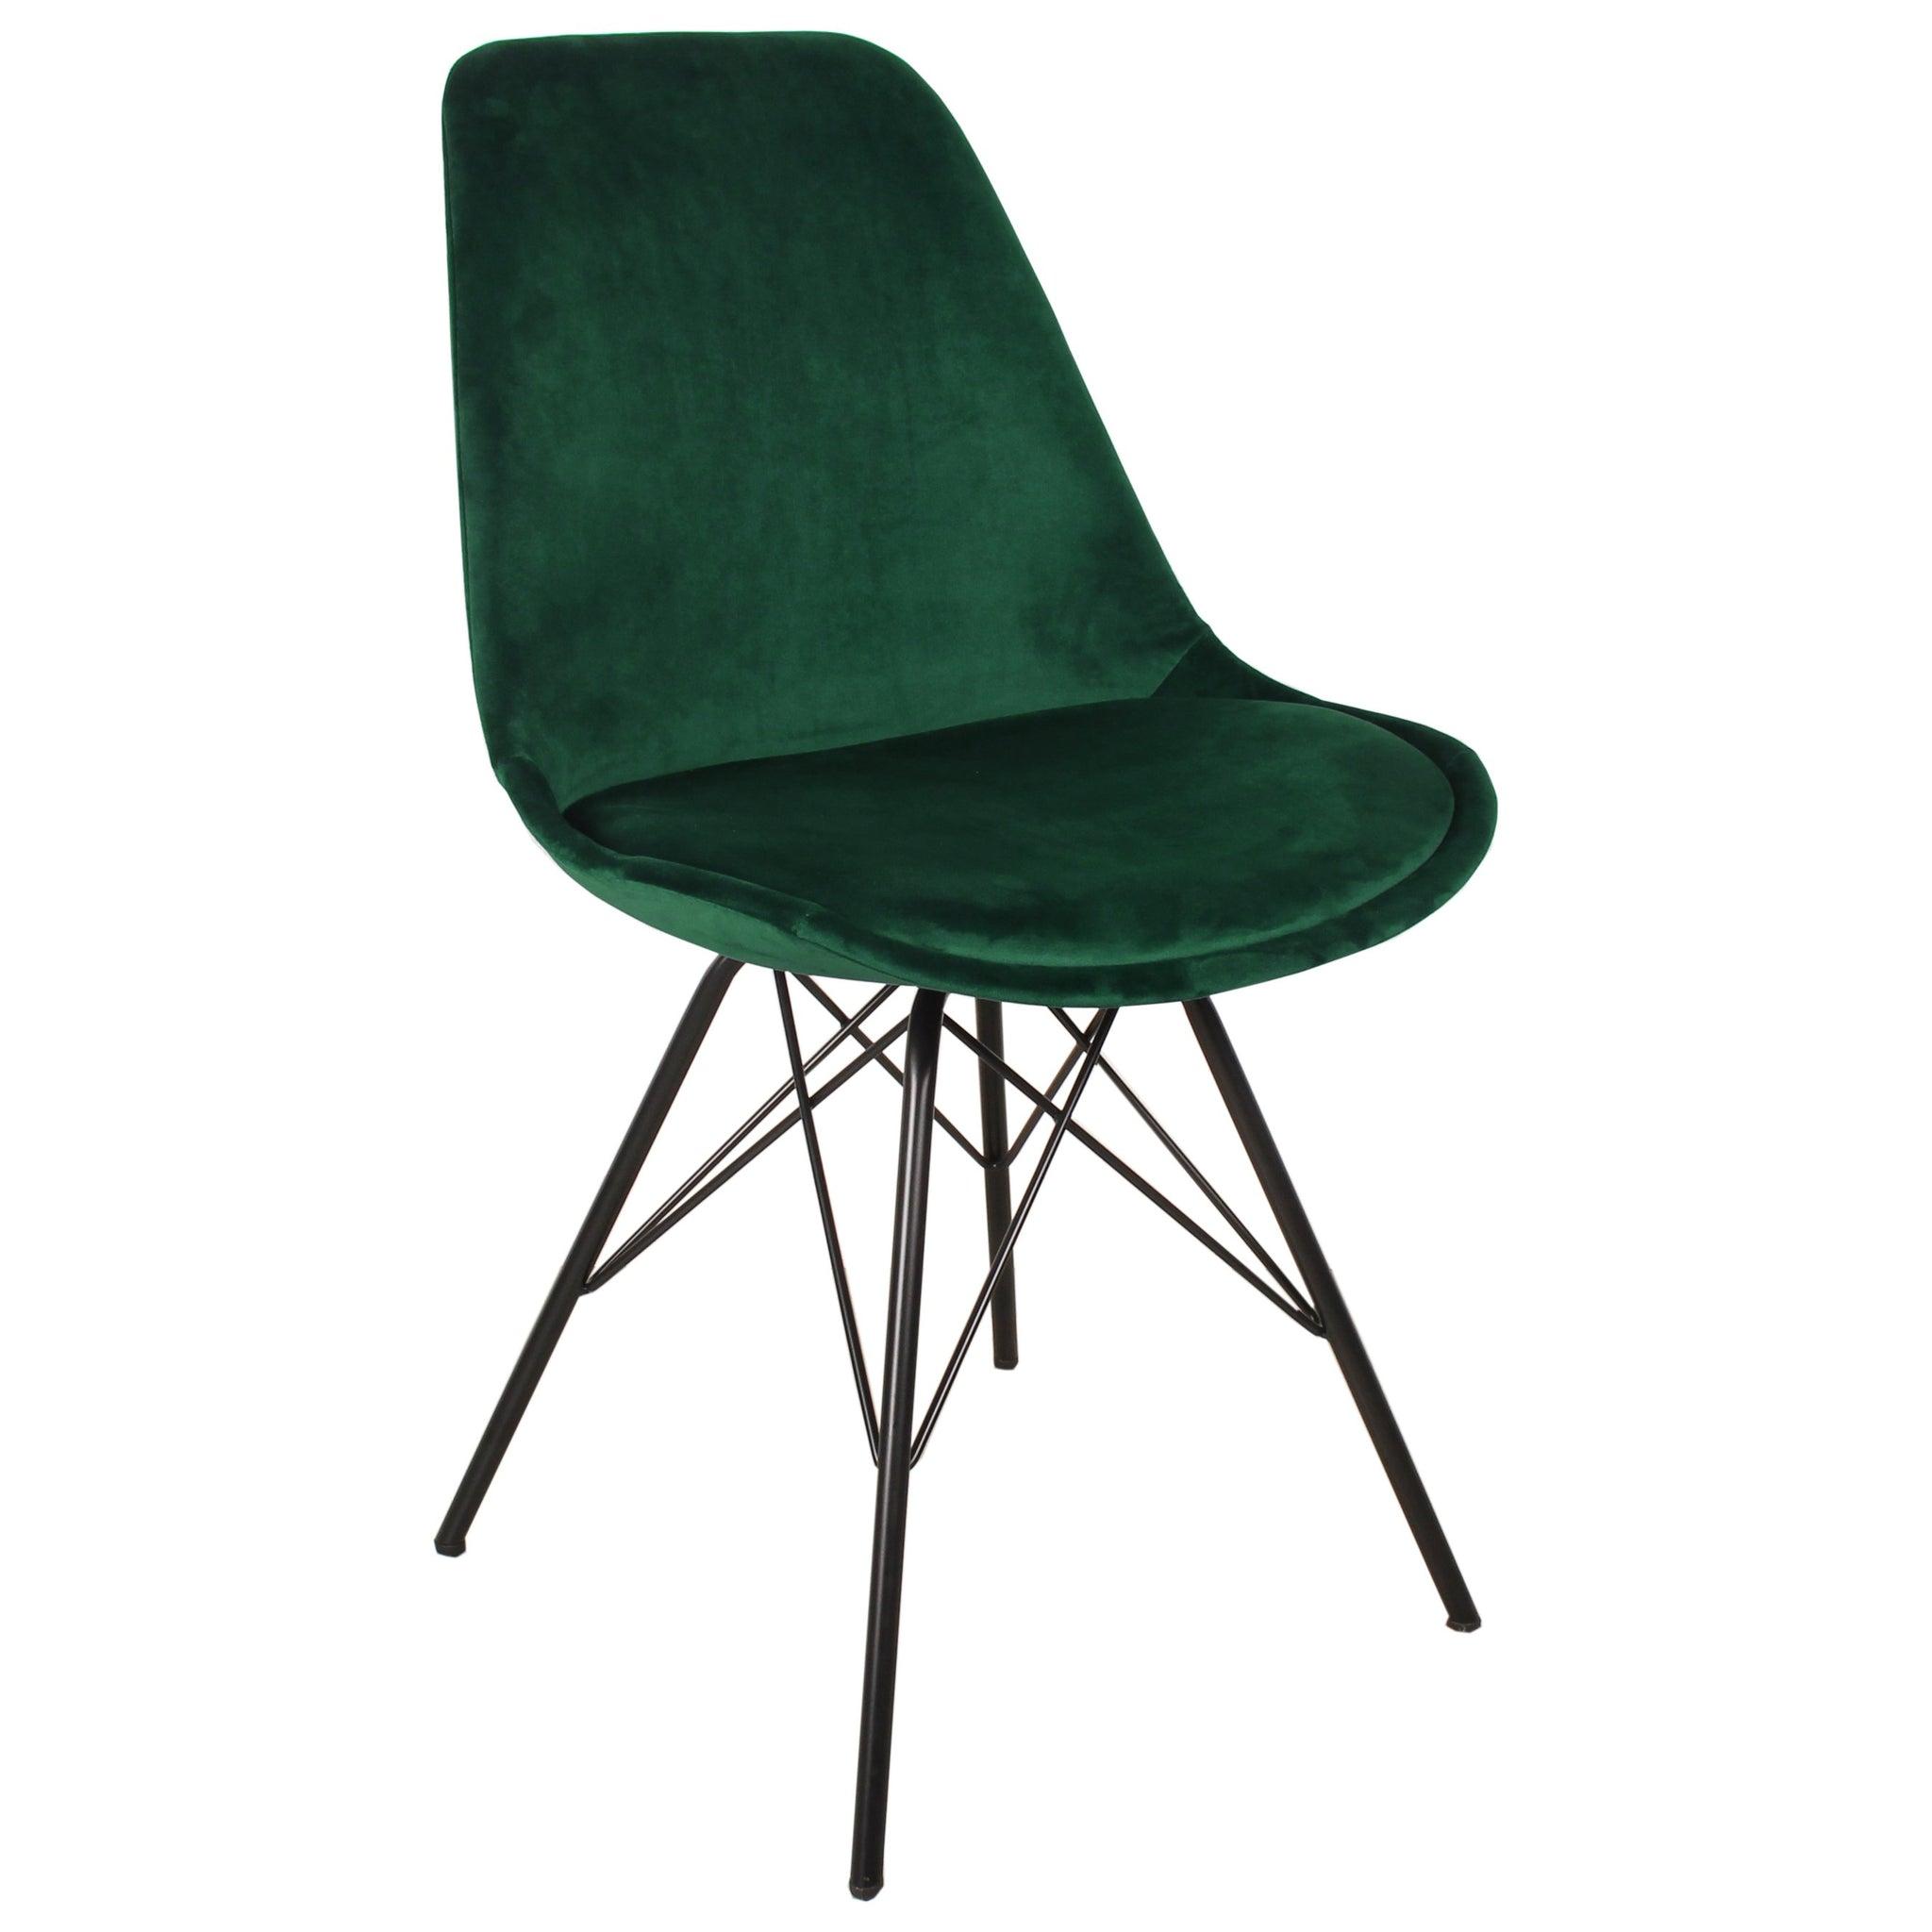 Nimara.dk Alberte matstol i sammet - Grön